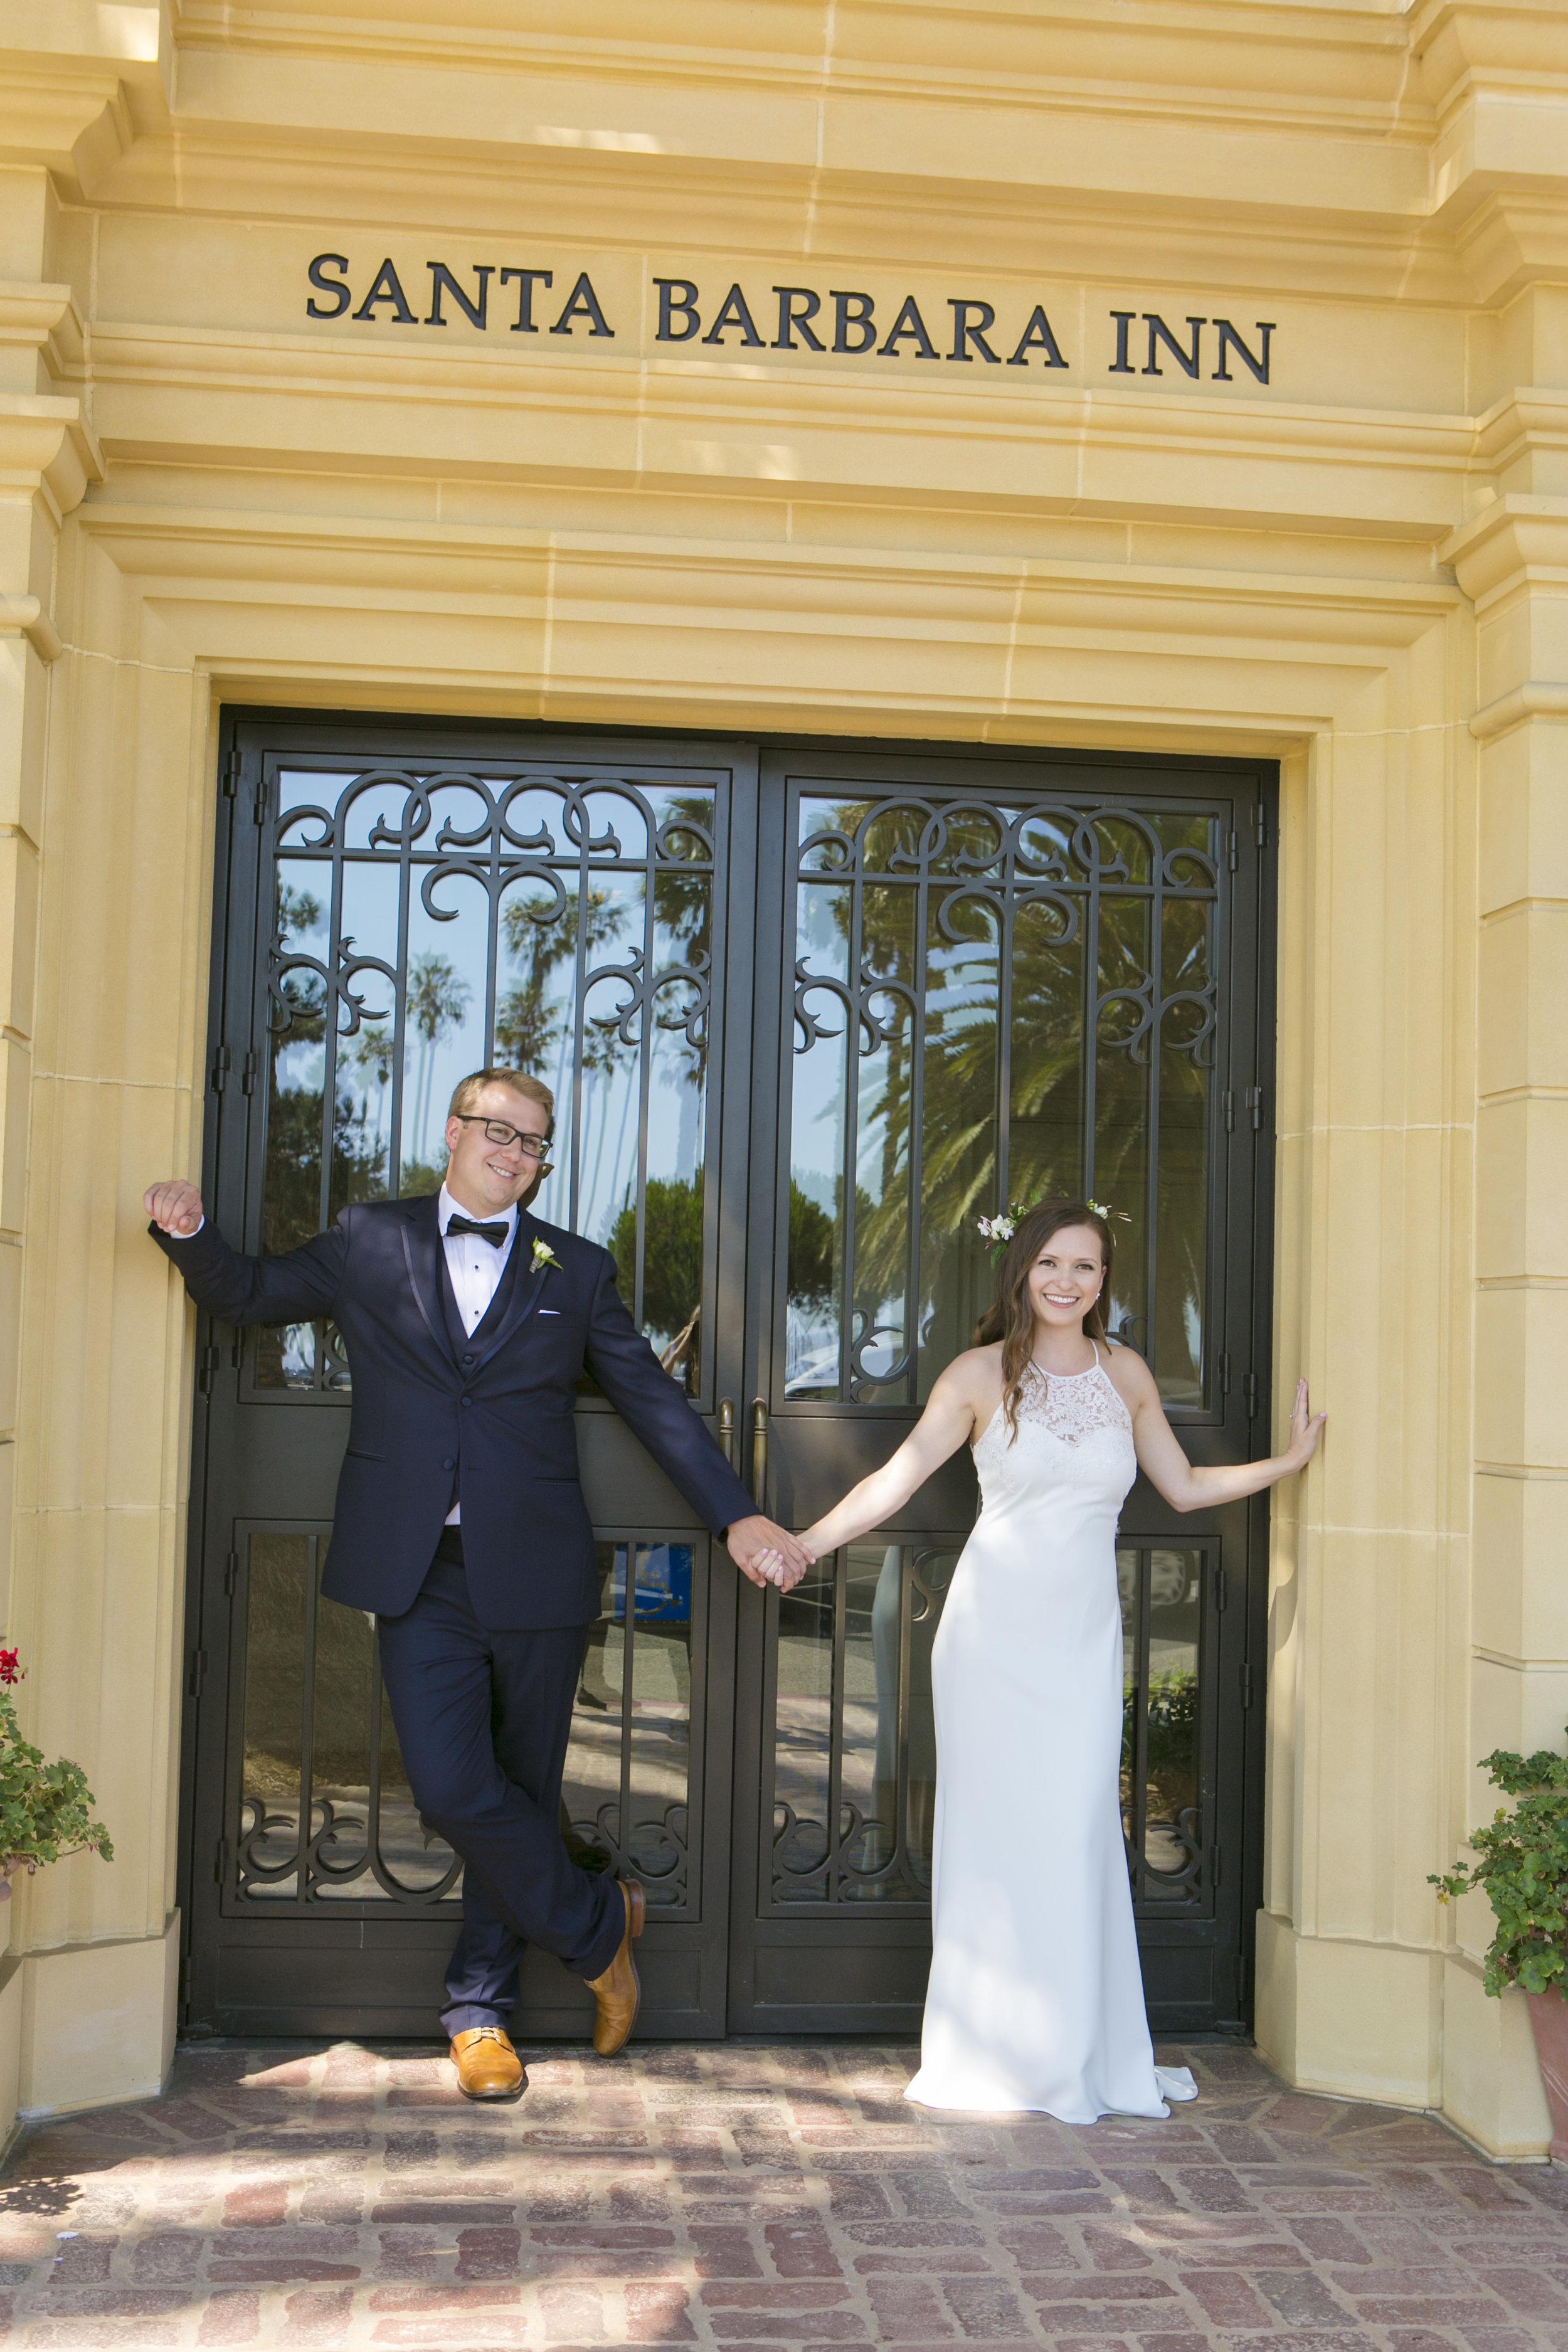 www.santabarbarawedding.com   ByCherry Photography   Felici Events   Convivo Restaurant   Bride and Groom